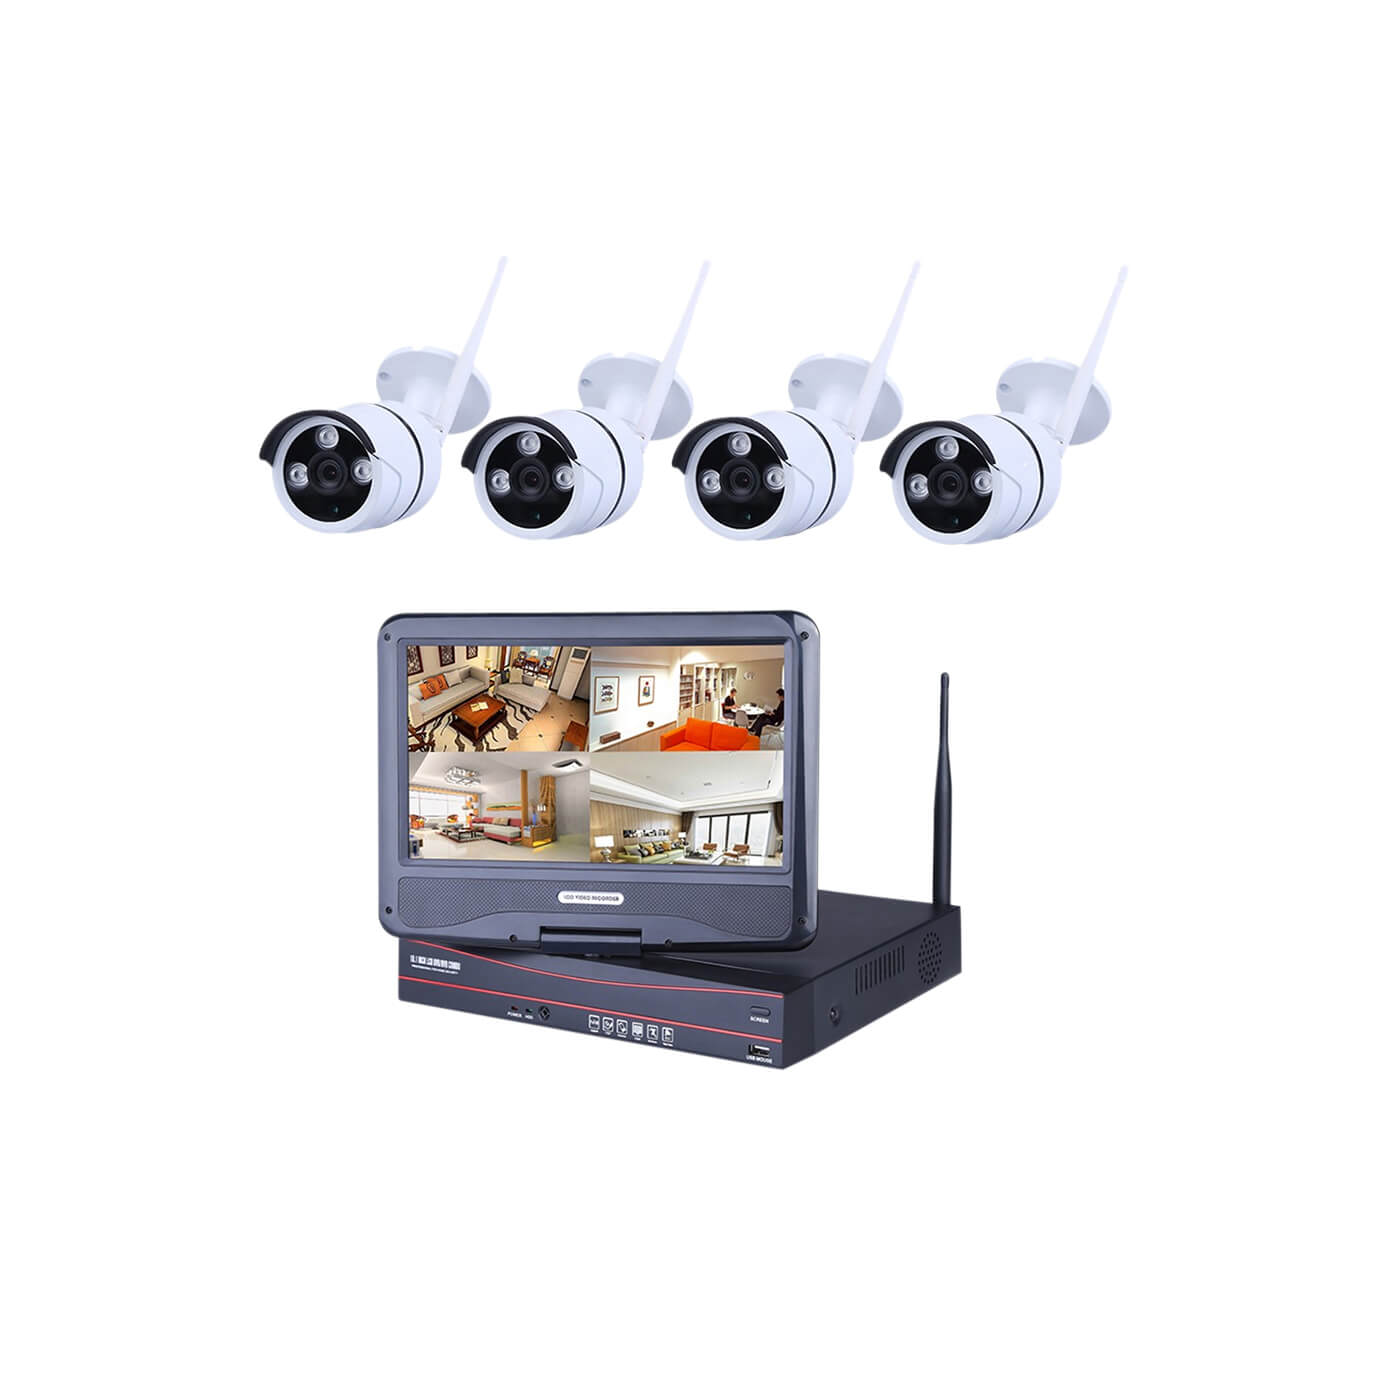 Ener-J Outdoor Wireless Wi-fi IP Camera System - 4 Cameras